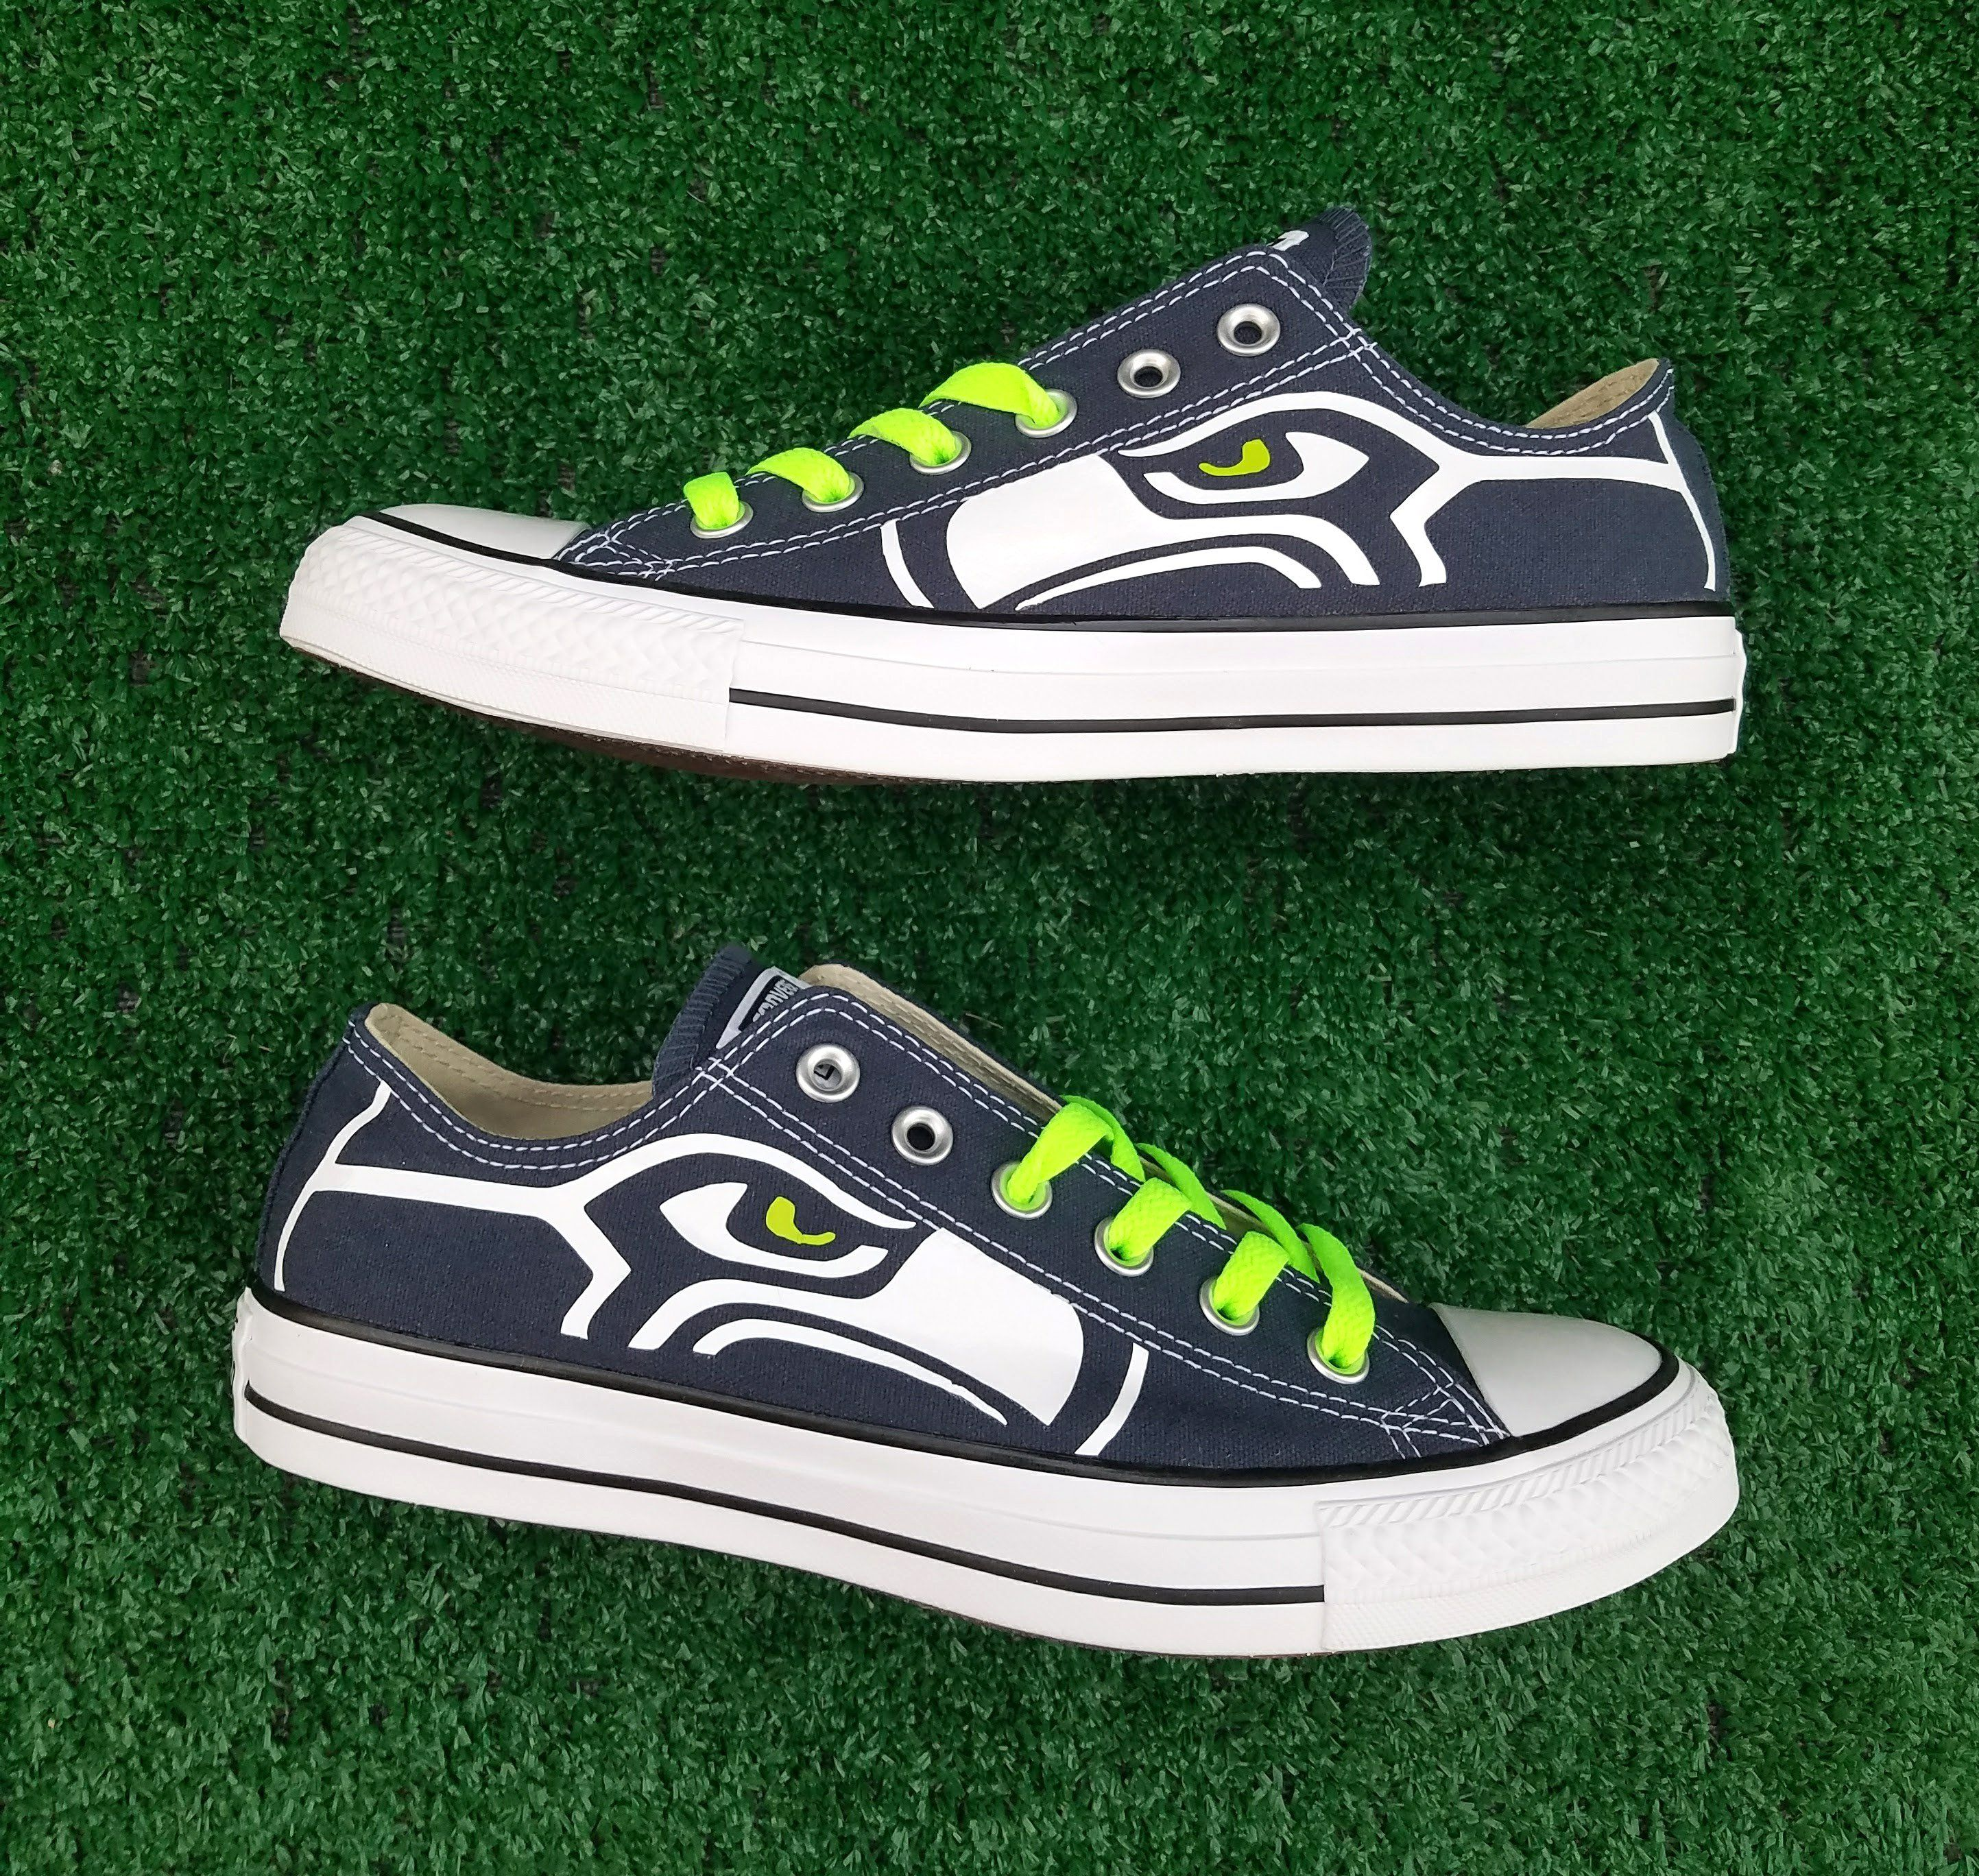 917846d6cdedf8 Customized Seattle Seahawks Converse Sneakers